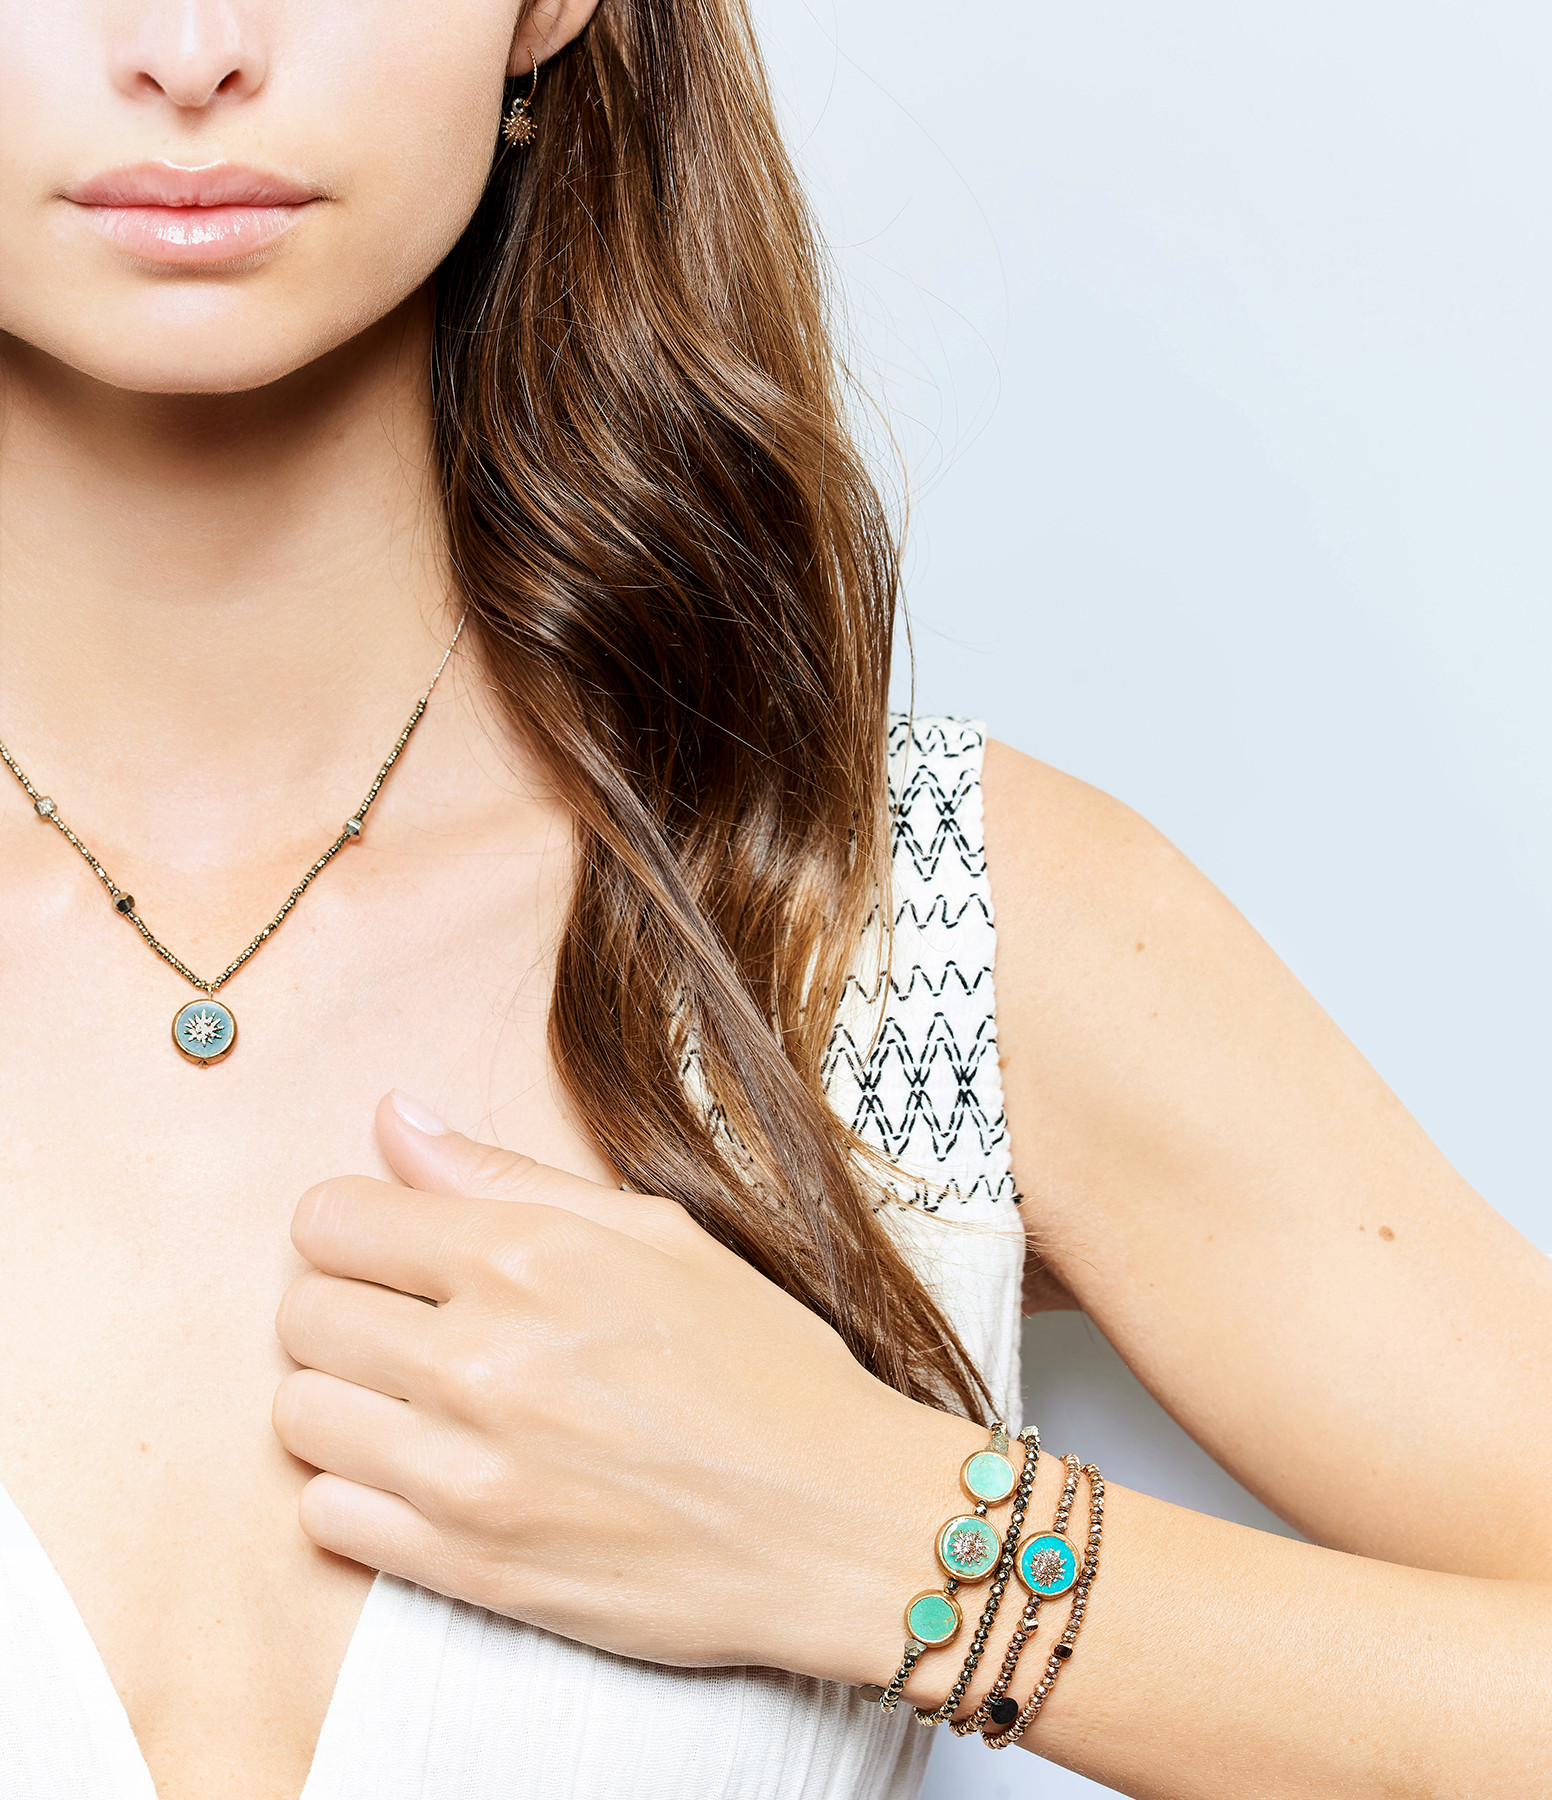 LSONGE - Bracelet Soleil Double Hématite Kaki 3 Turquoises